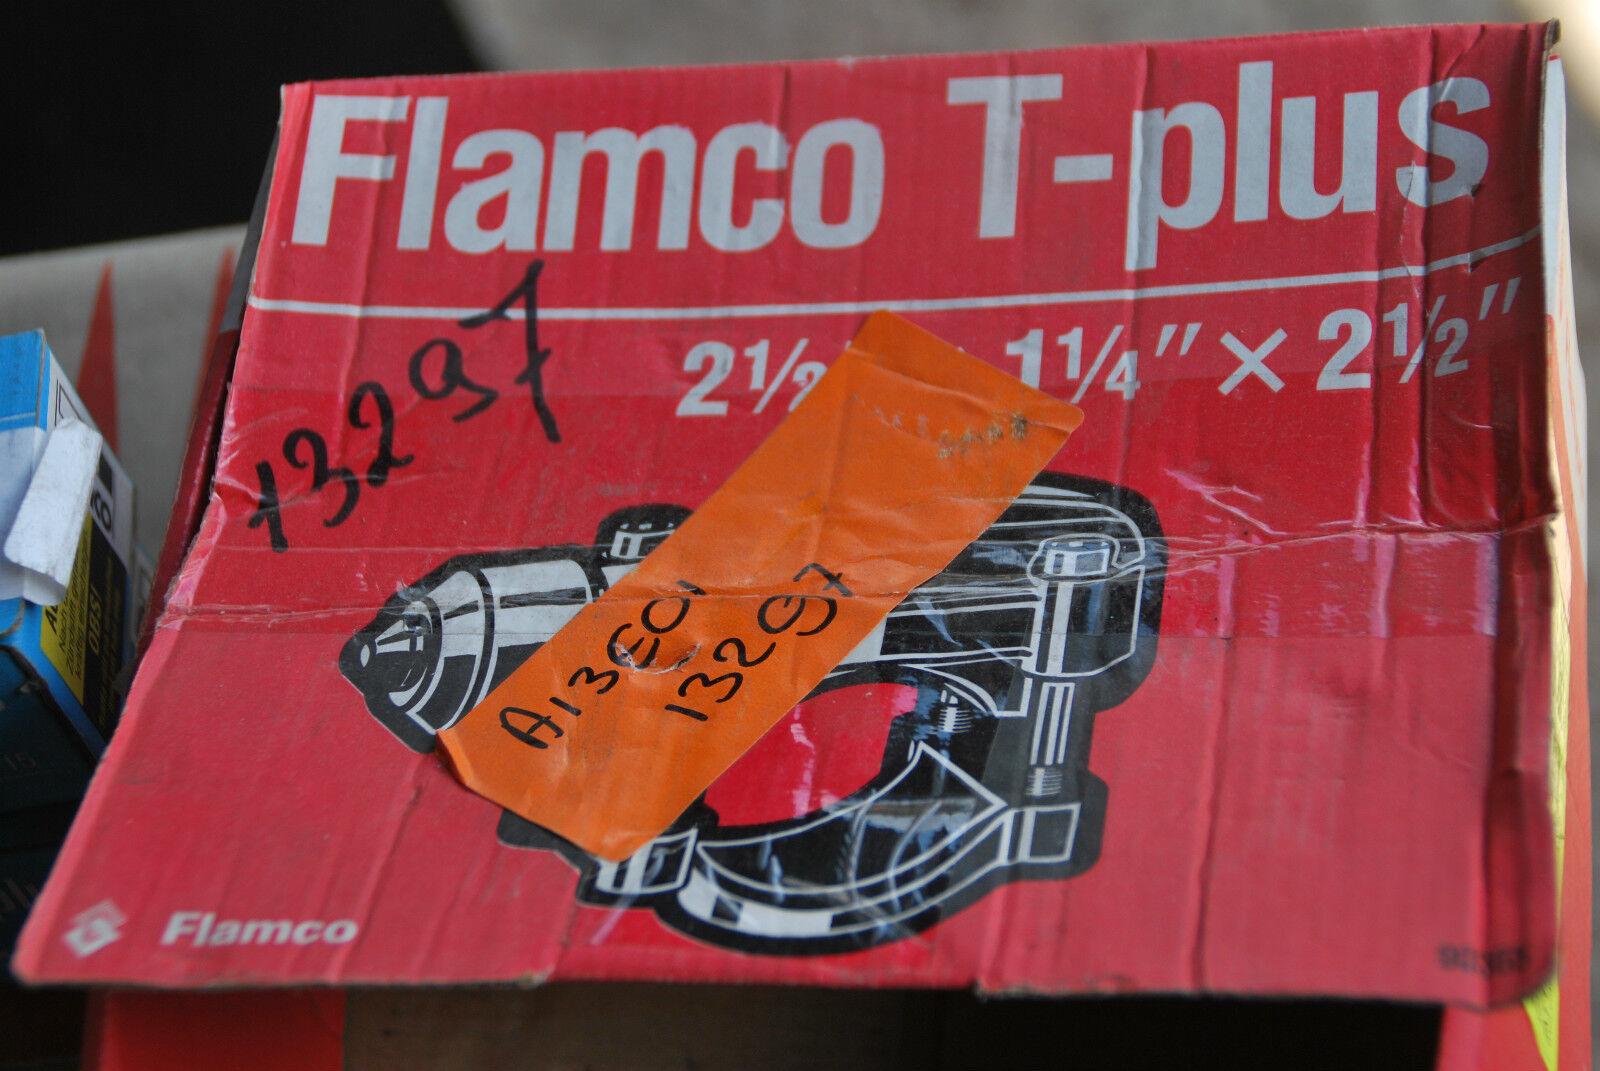 FLAMCO 90365 T-PLUS 2 1 2 x1 1 4 x 2 1 2   ABZWEIGUNG KNALLEFFEKT NEU